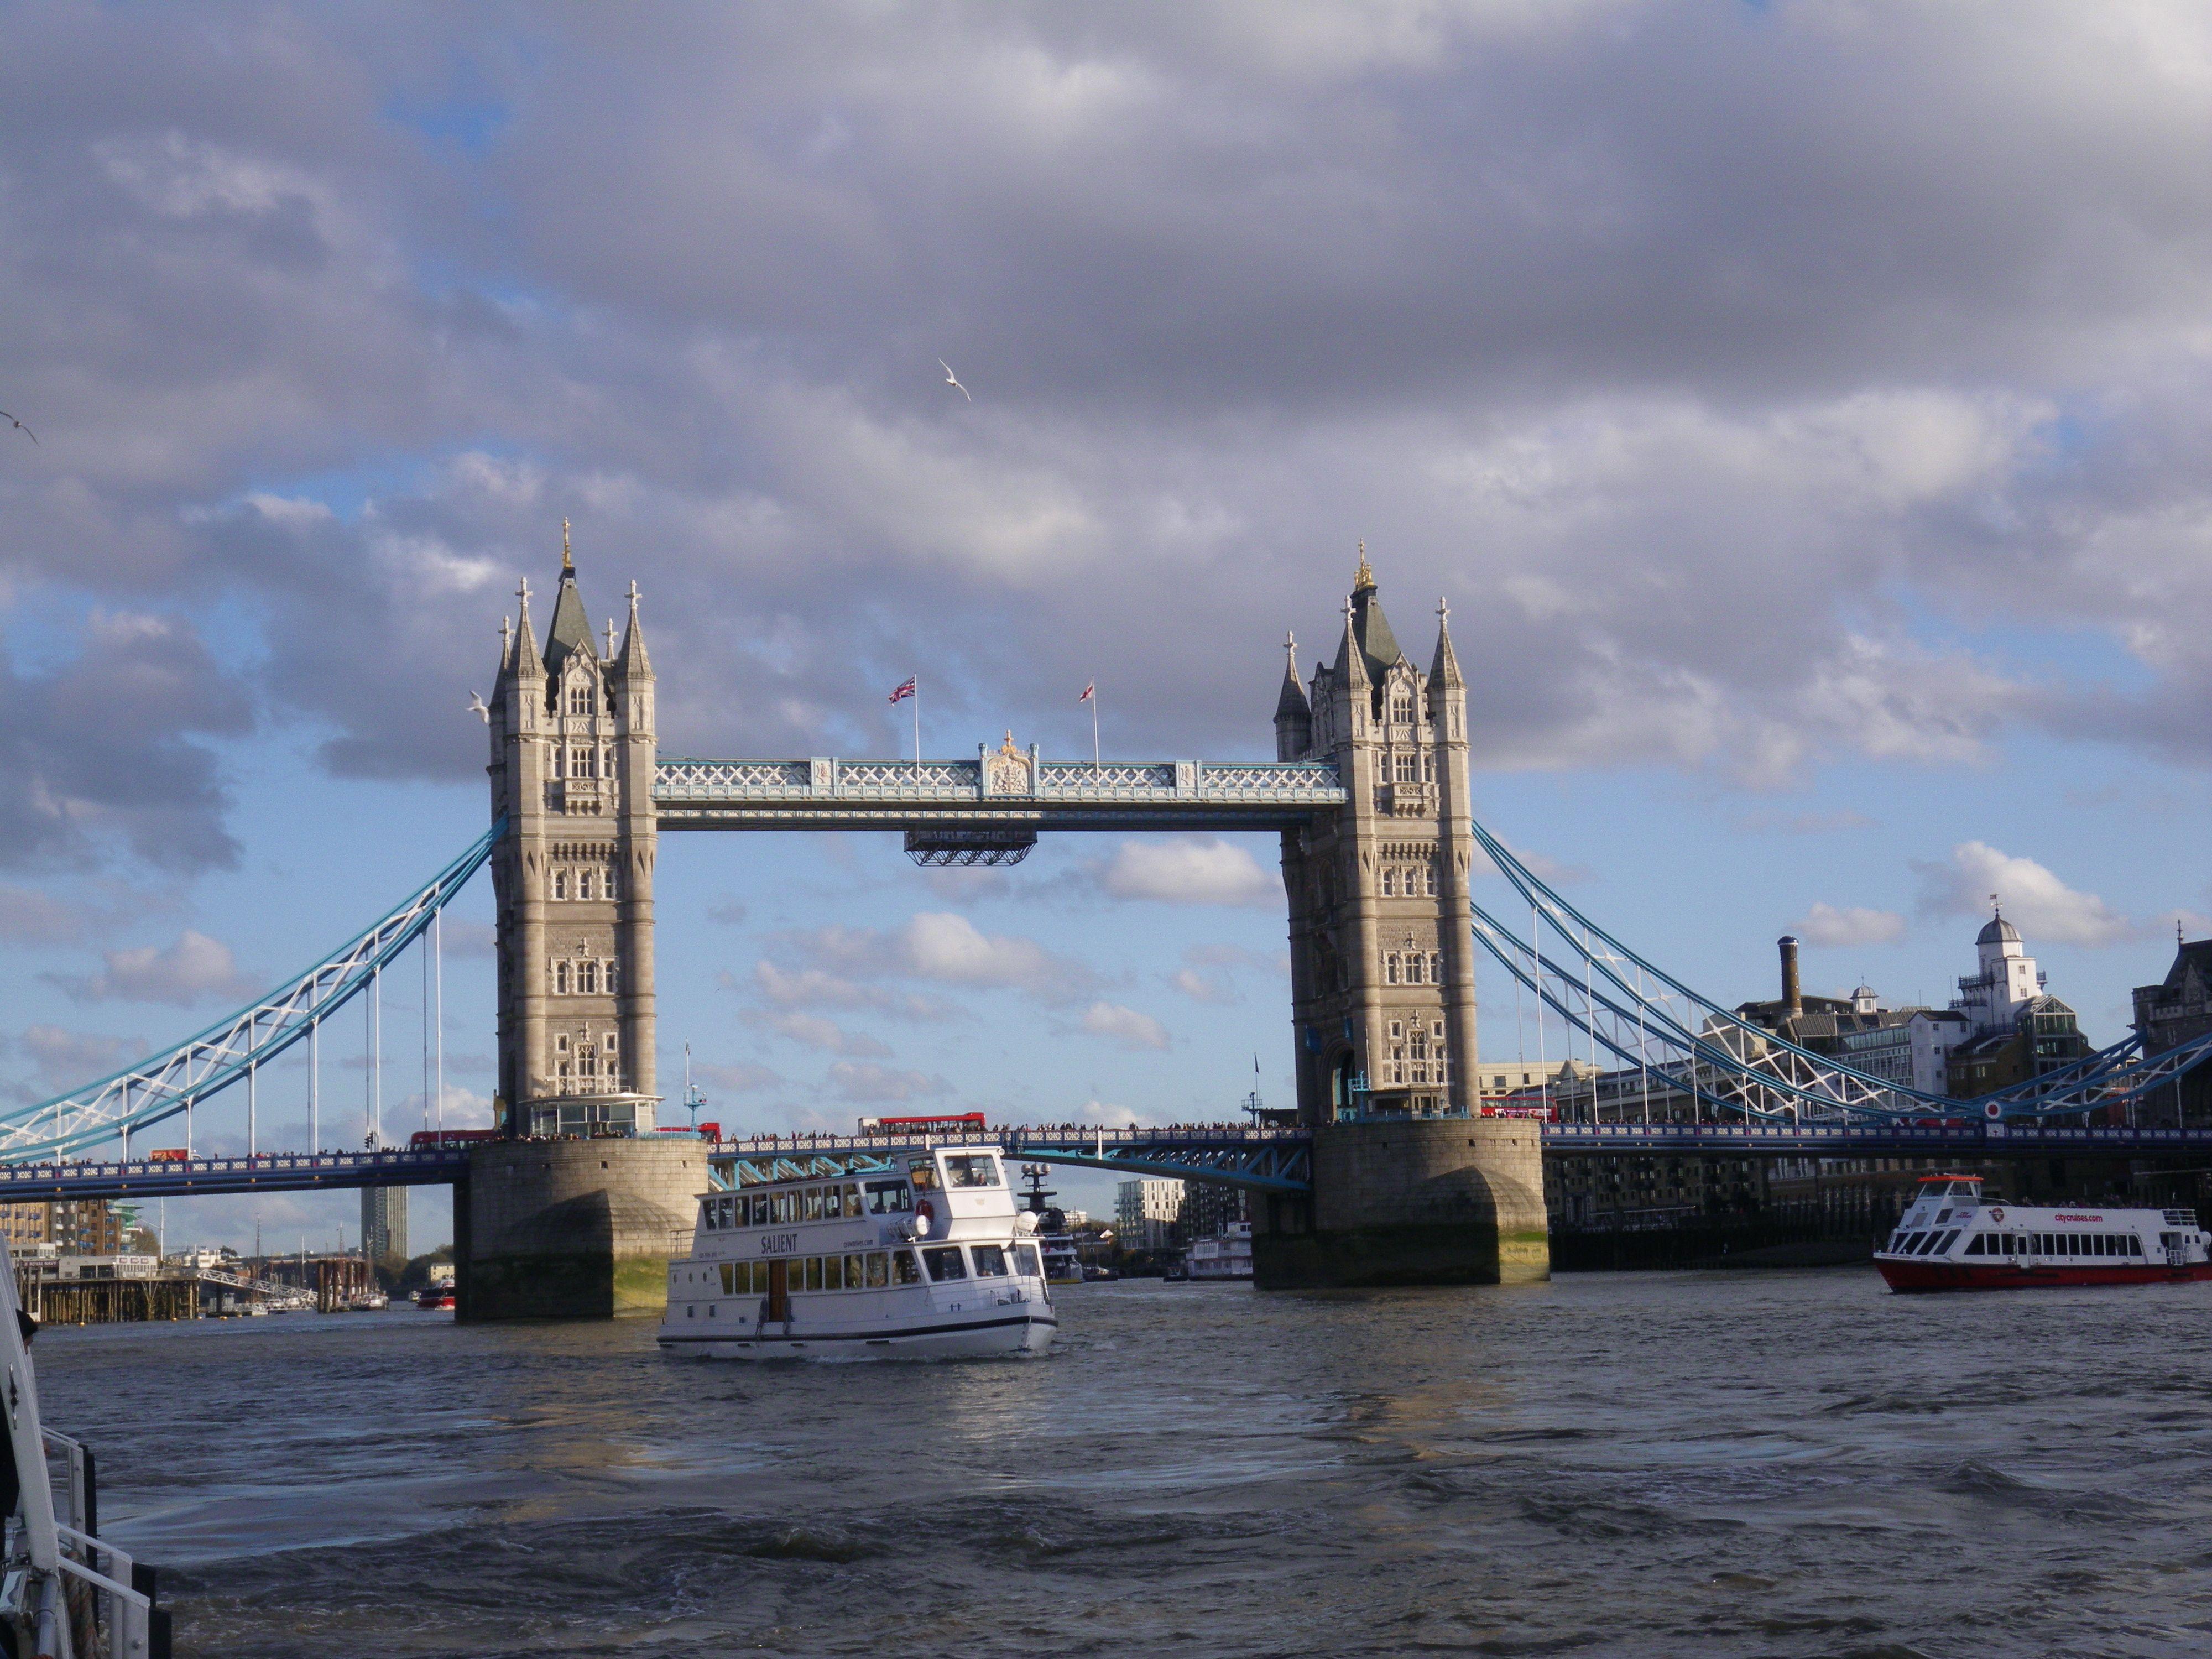 Sunny spell on London Bridge